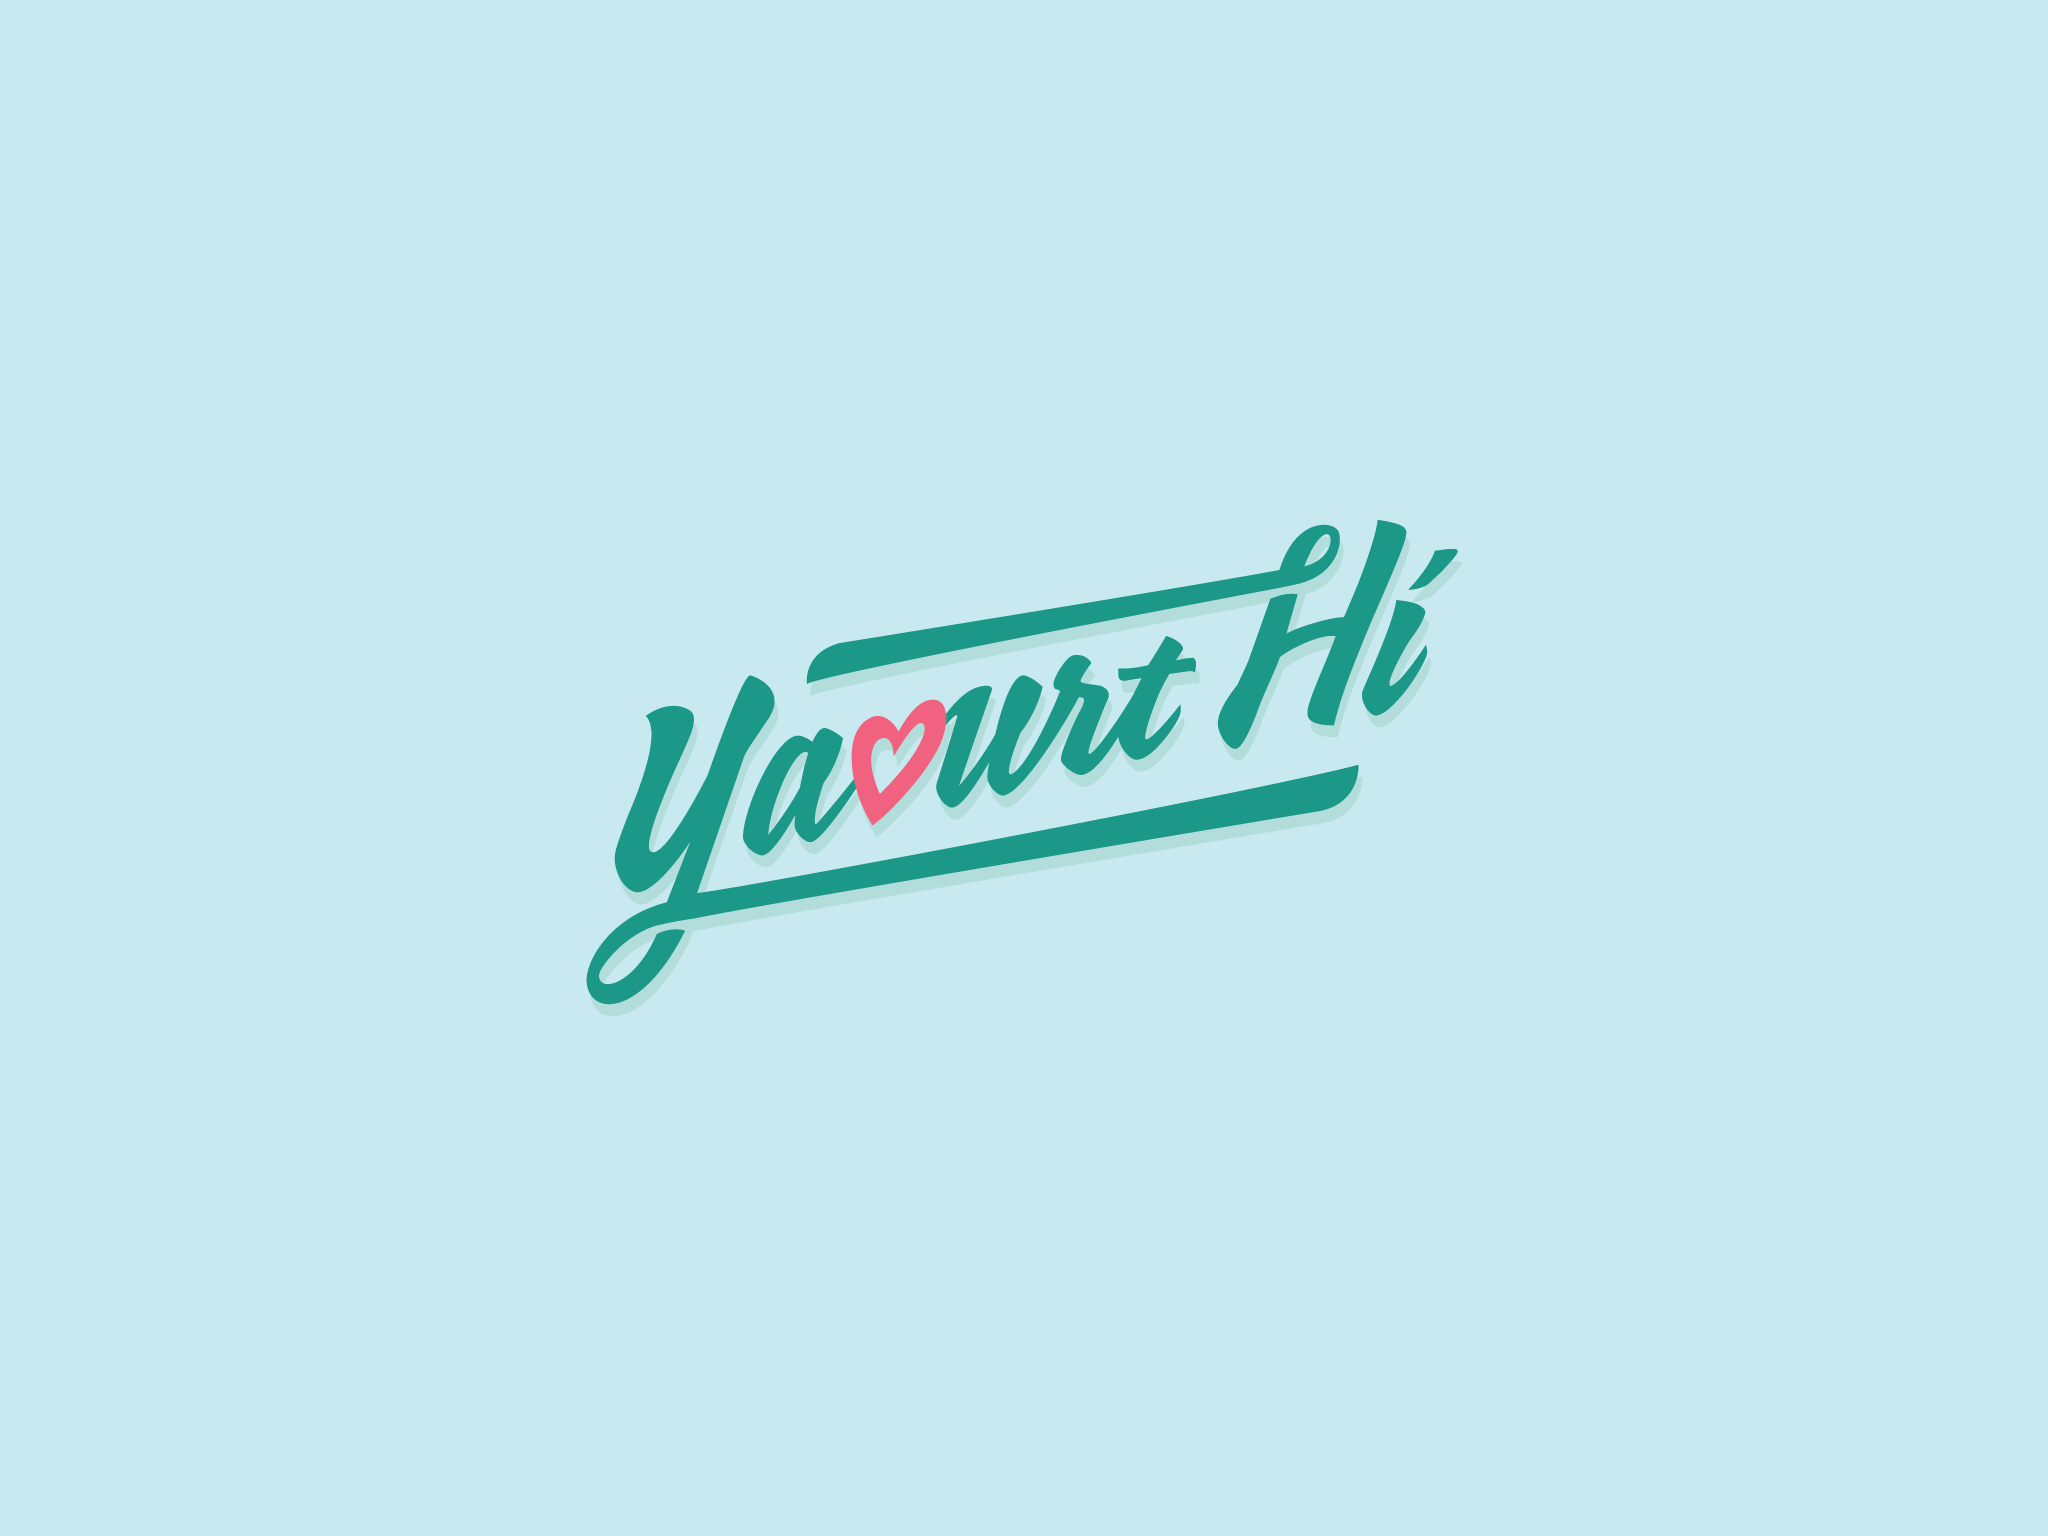 Logo Yaourt Hí